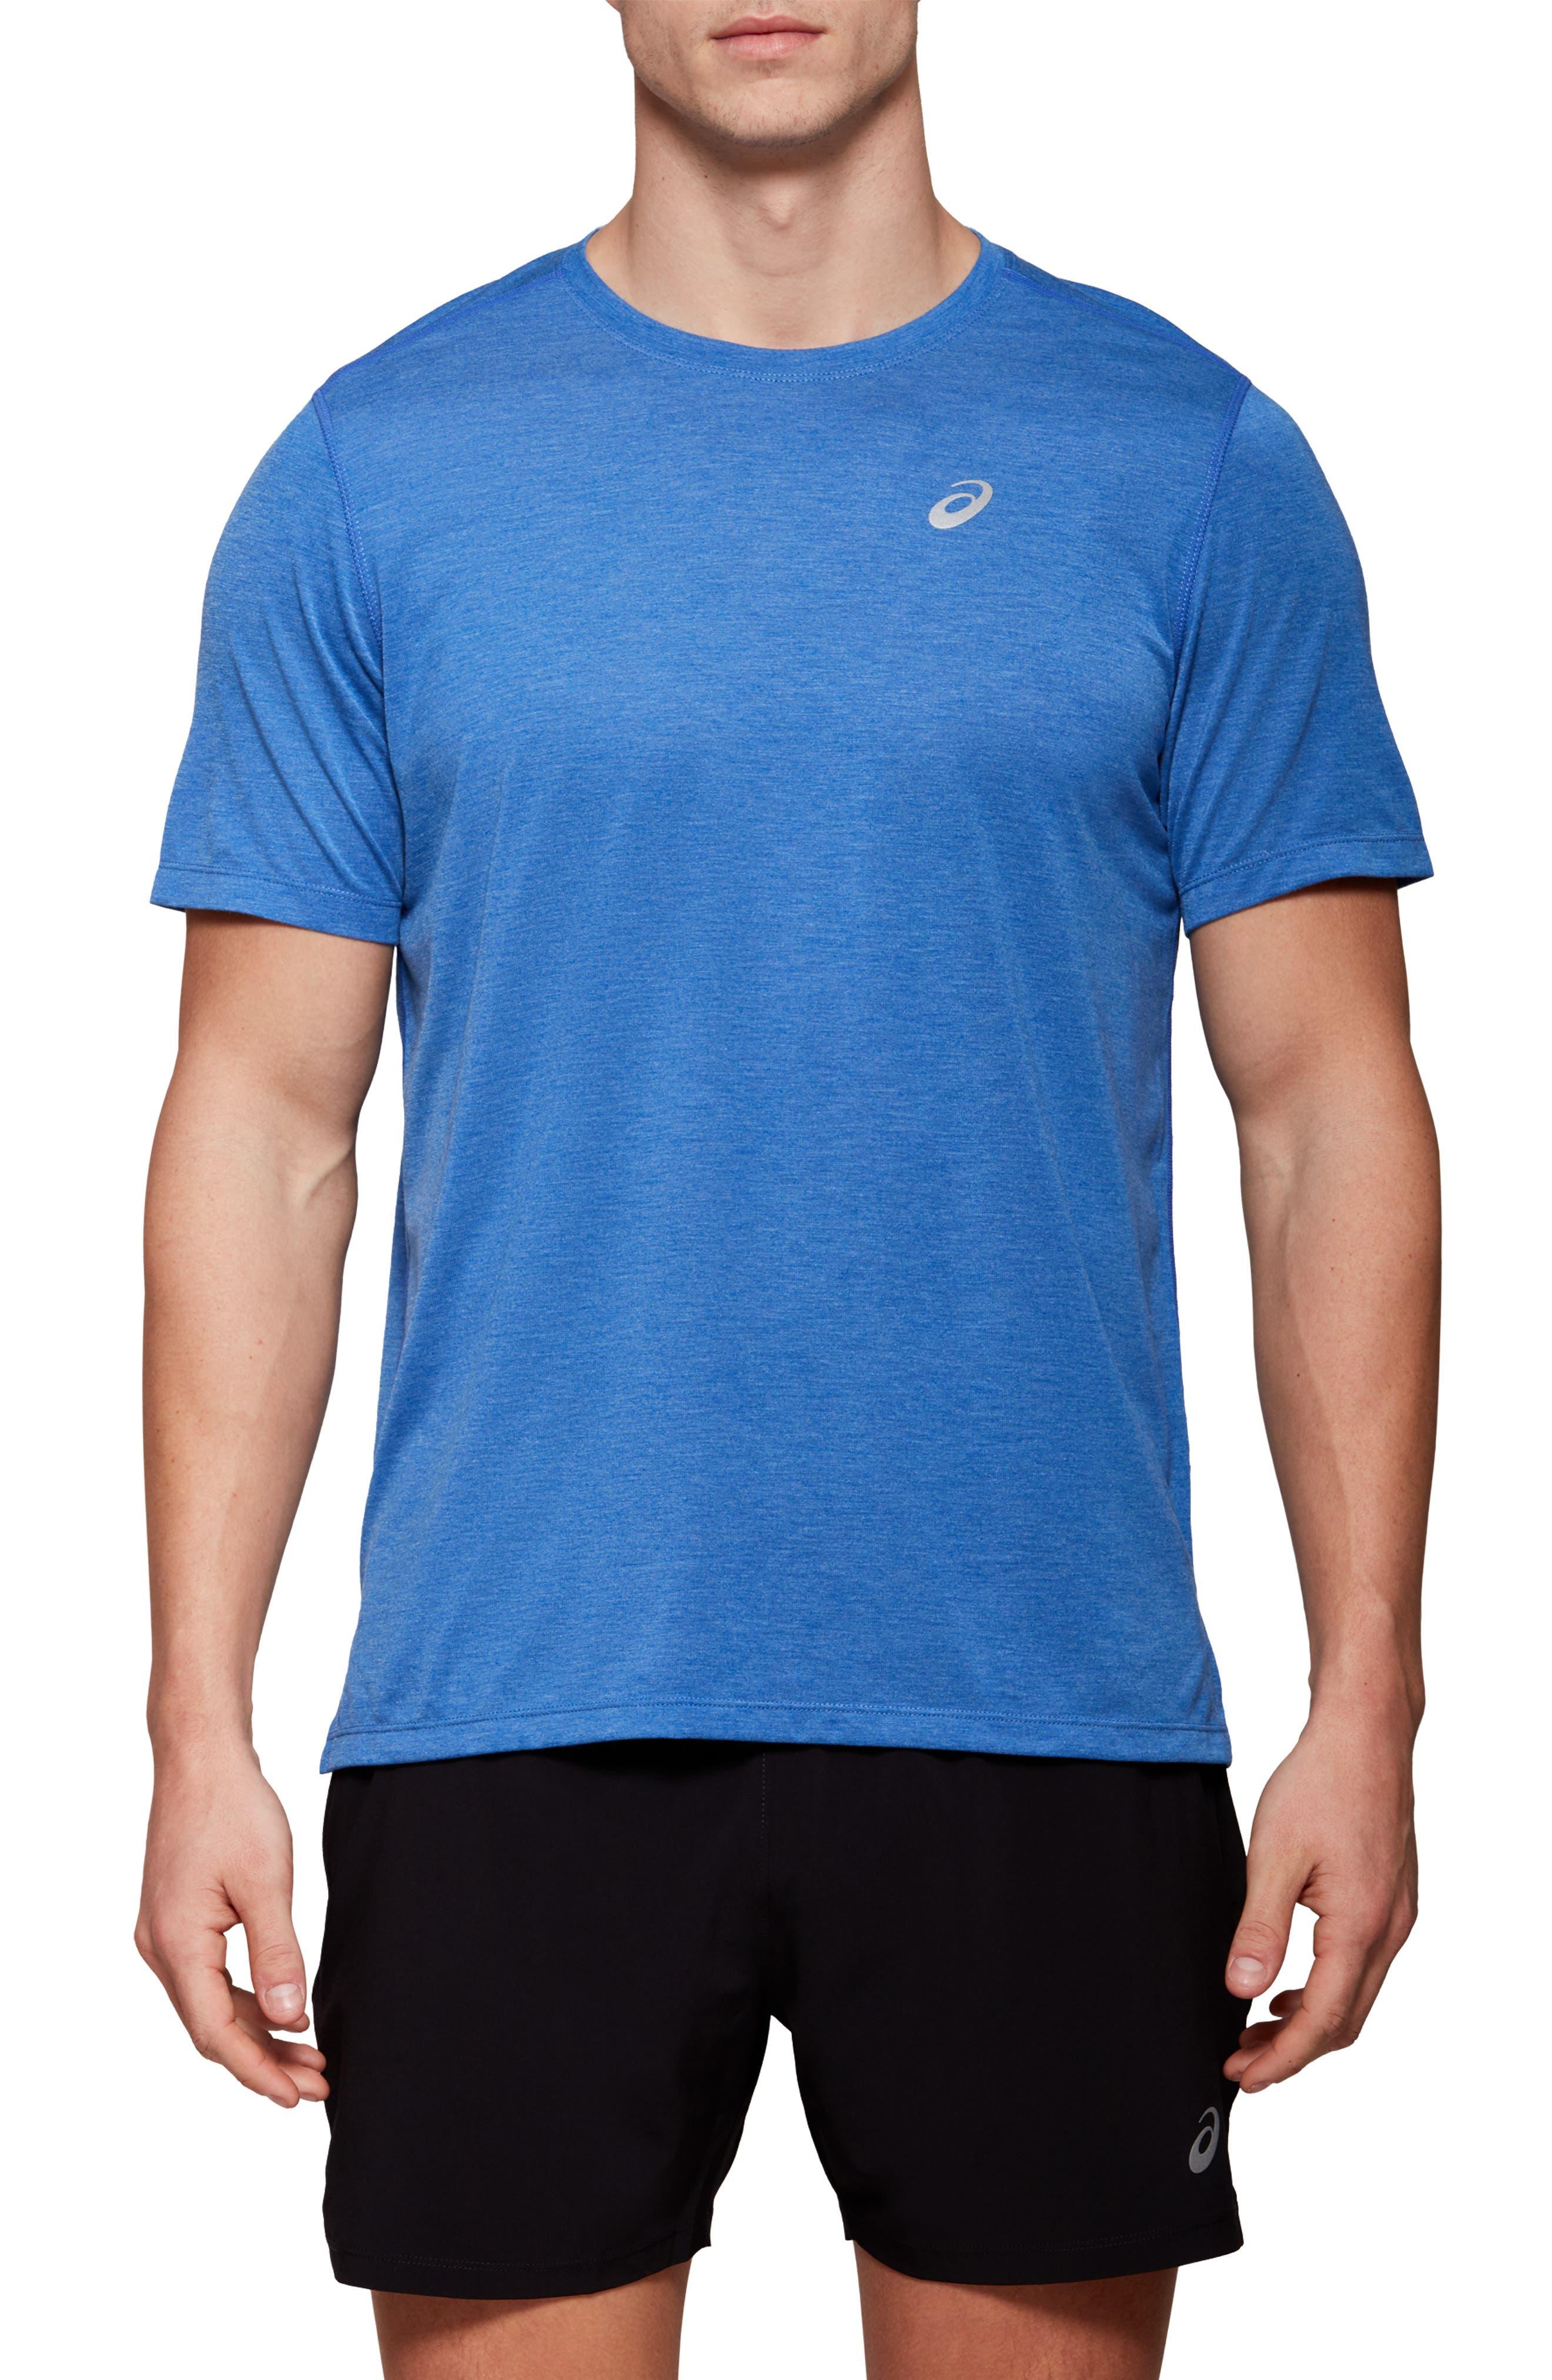 Men's Asics Dorai Short-Sleeve T-Shirt